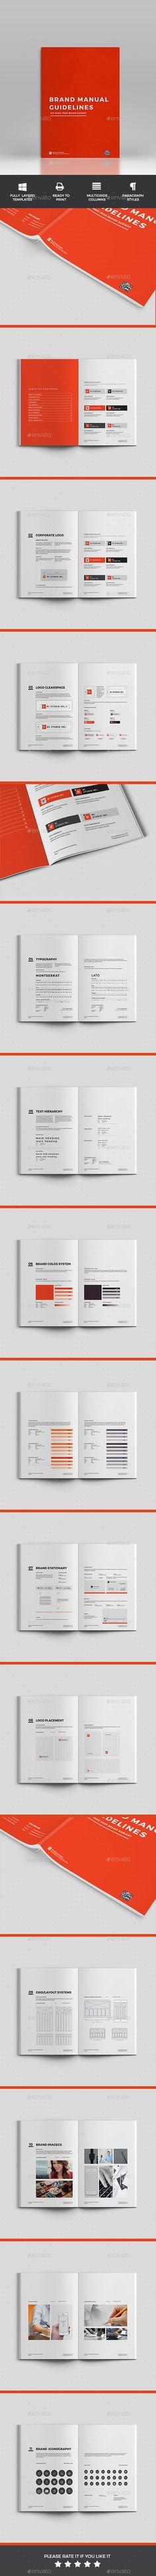 Brand Manual Template #design Buy Now: http://graphicriver.net/item/brand-manual/12874464?ref=ksioks